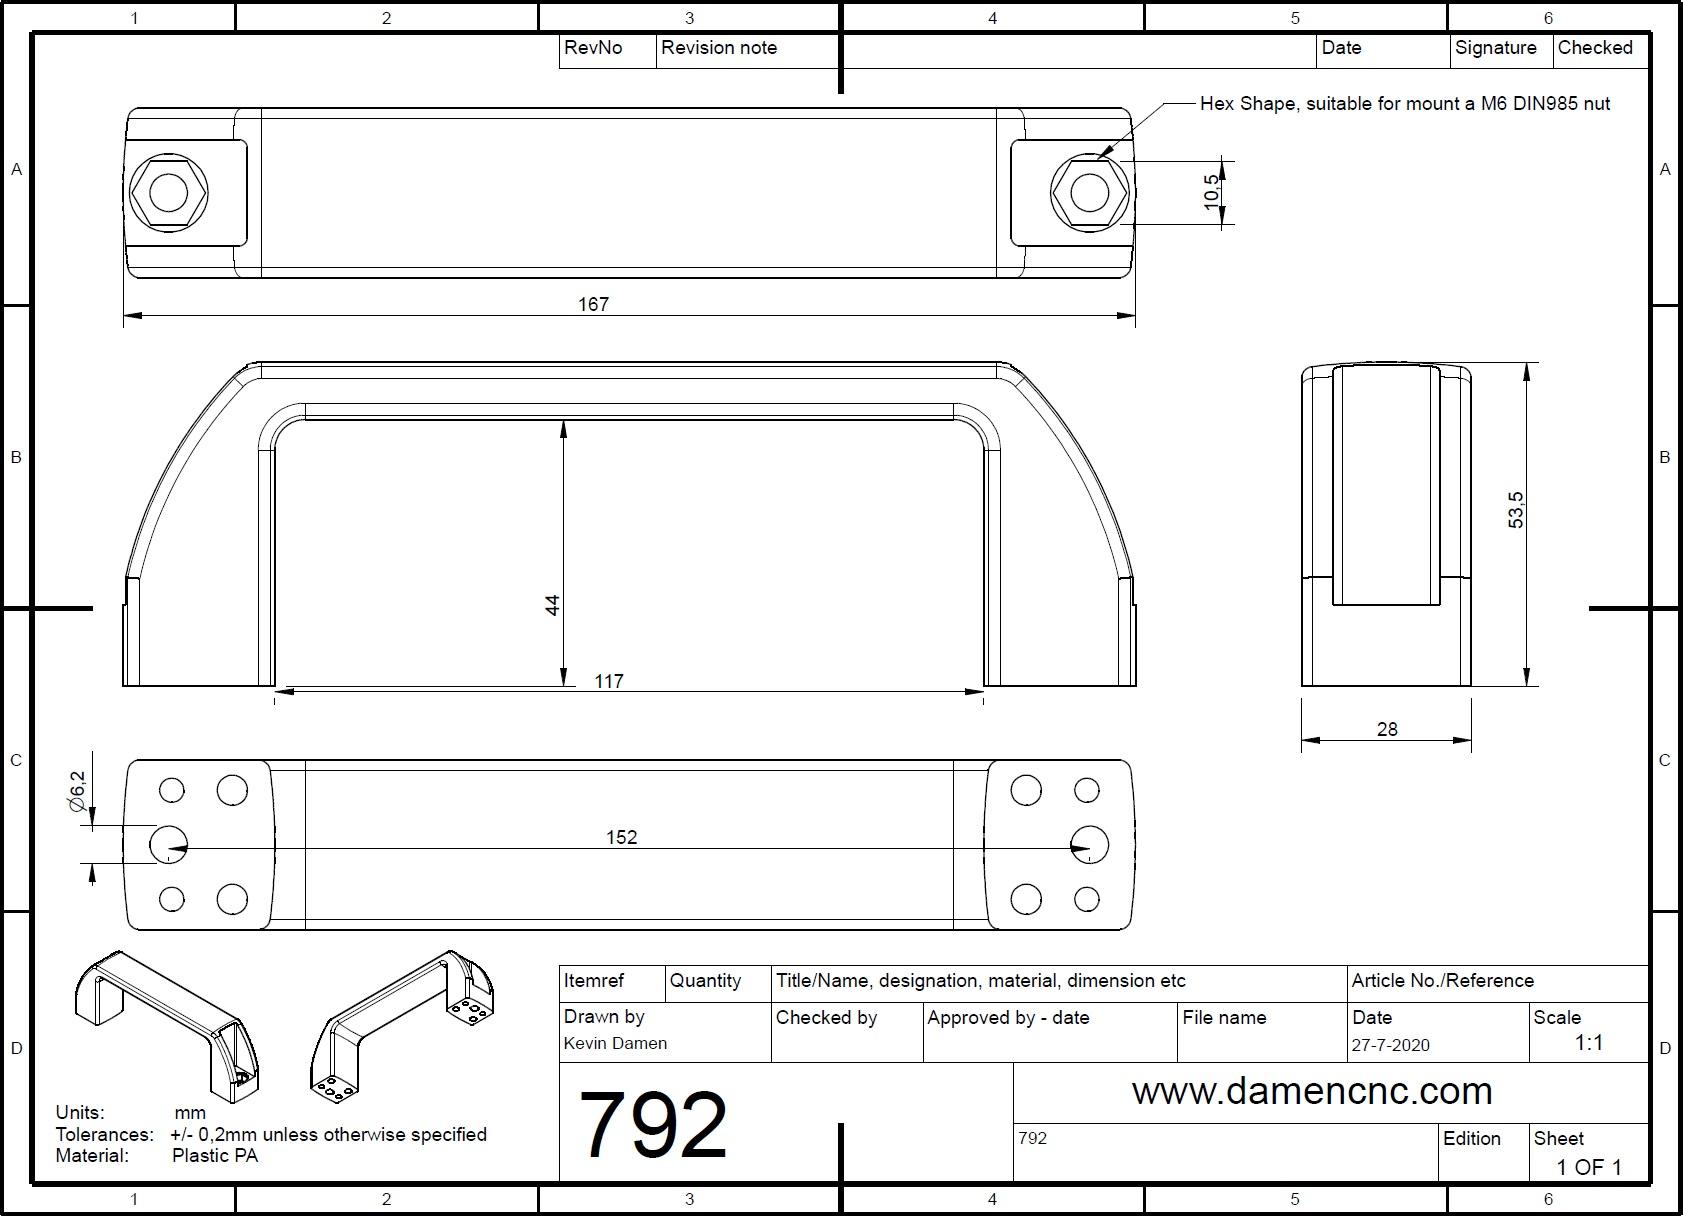 7923 handle pa plastic black a170 a152mm b28 h52mm 2d dimensions